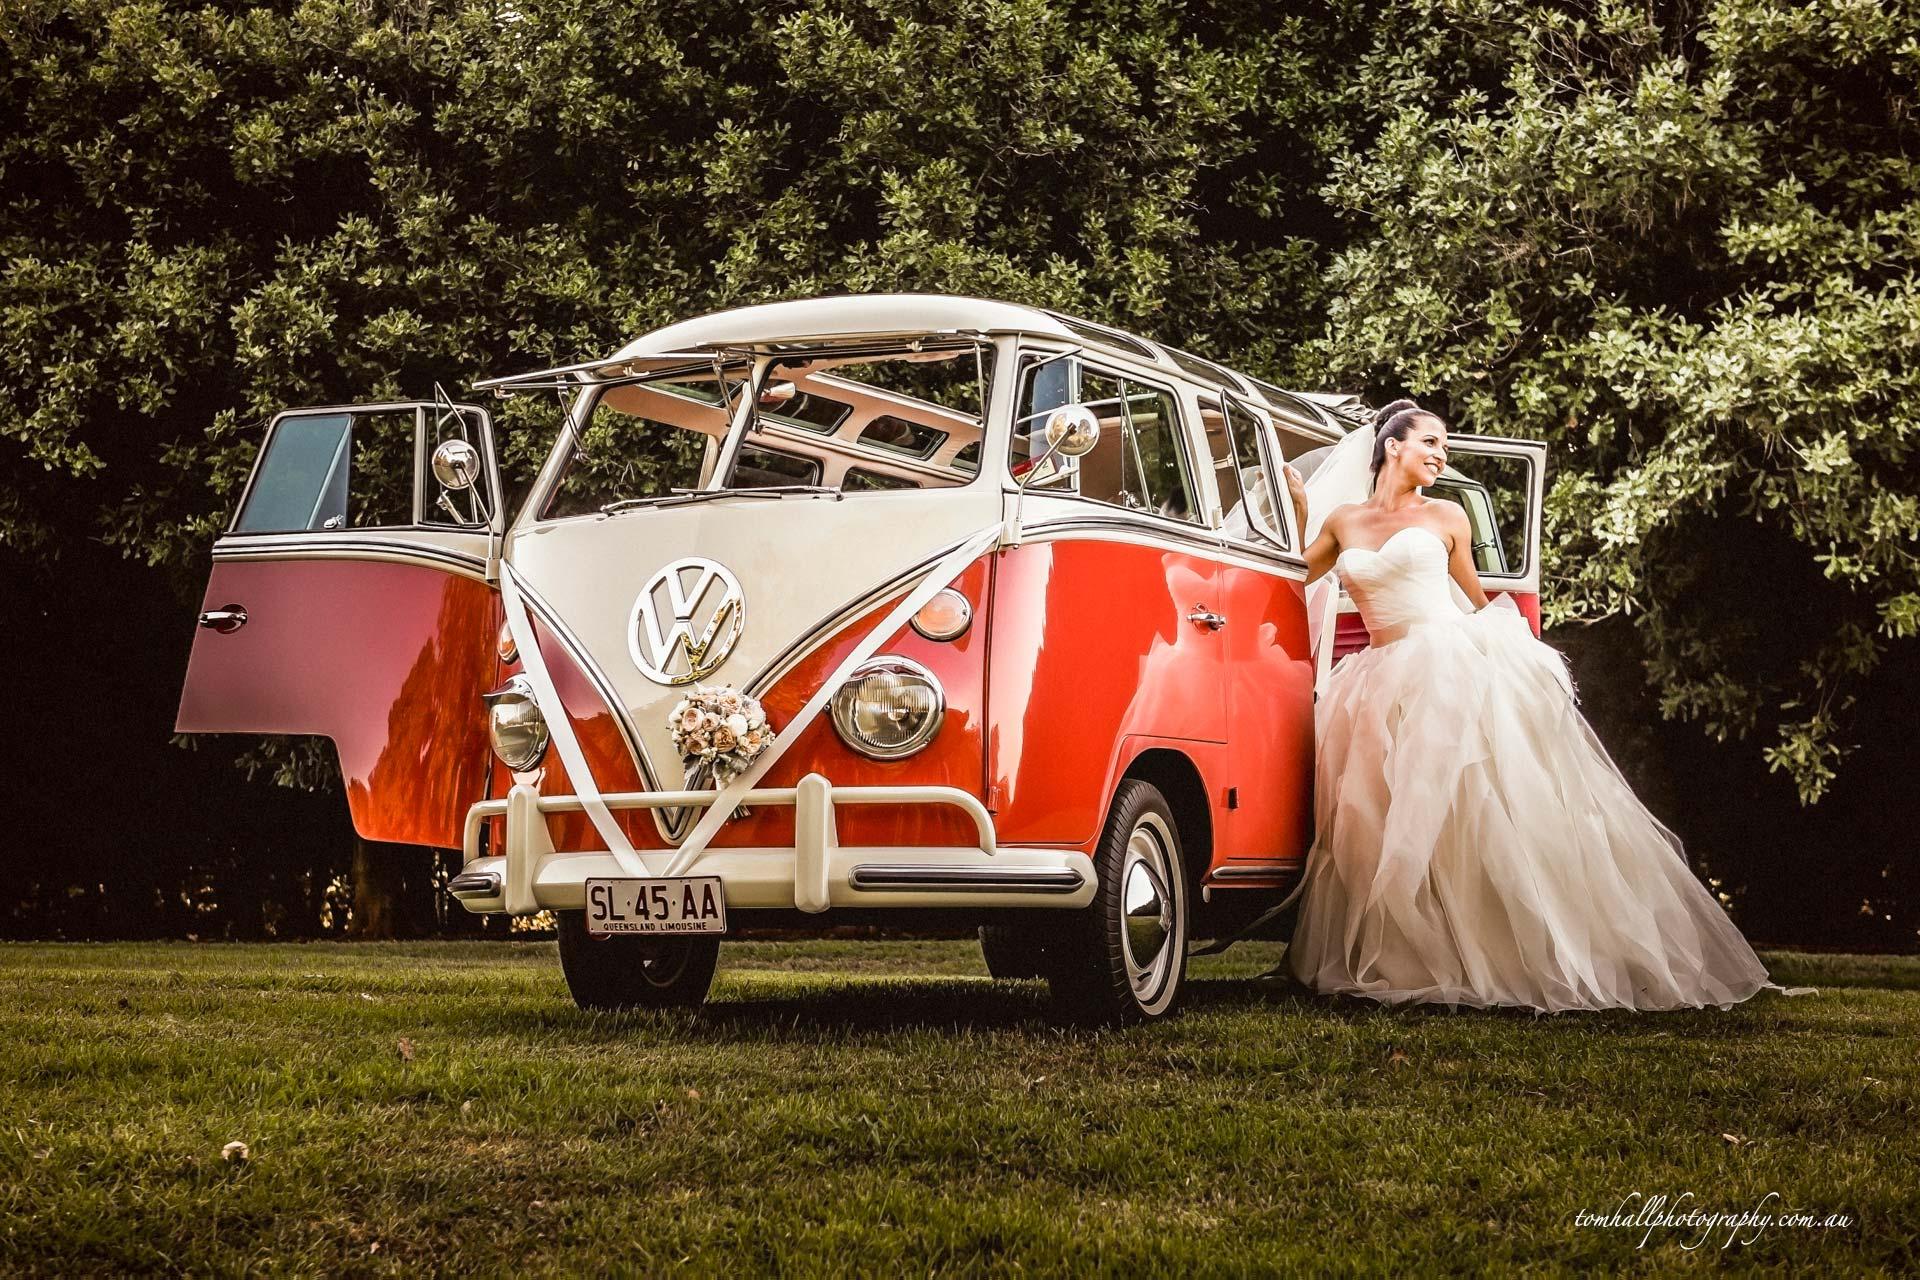 Deluxe Kombi Service's Maleny wedding car